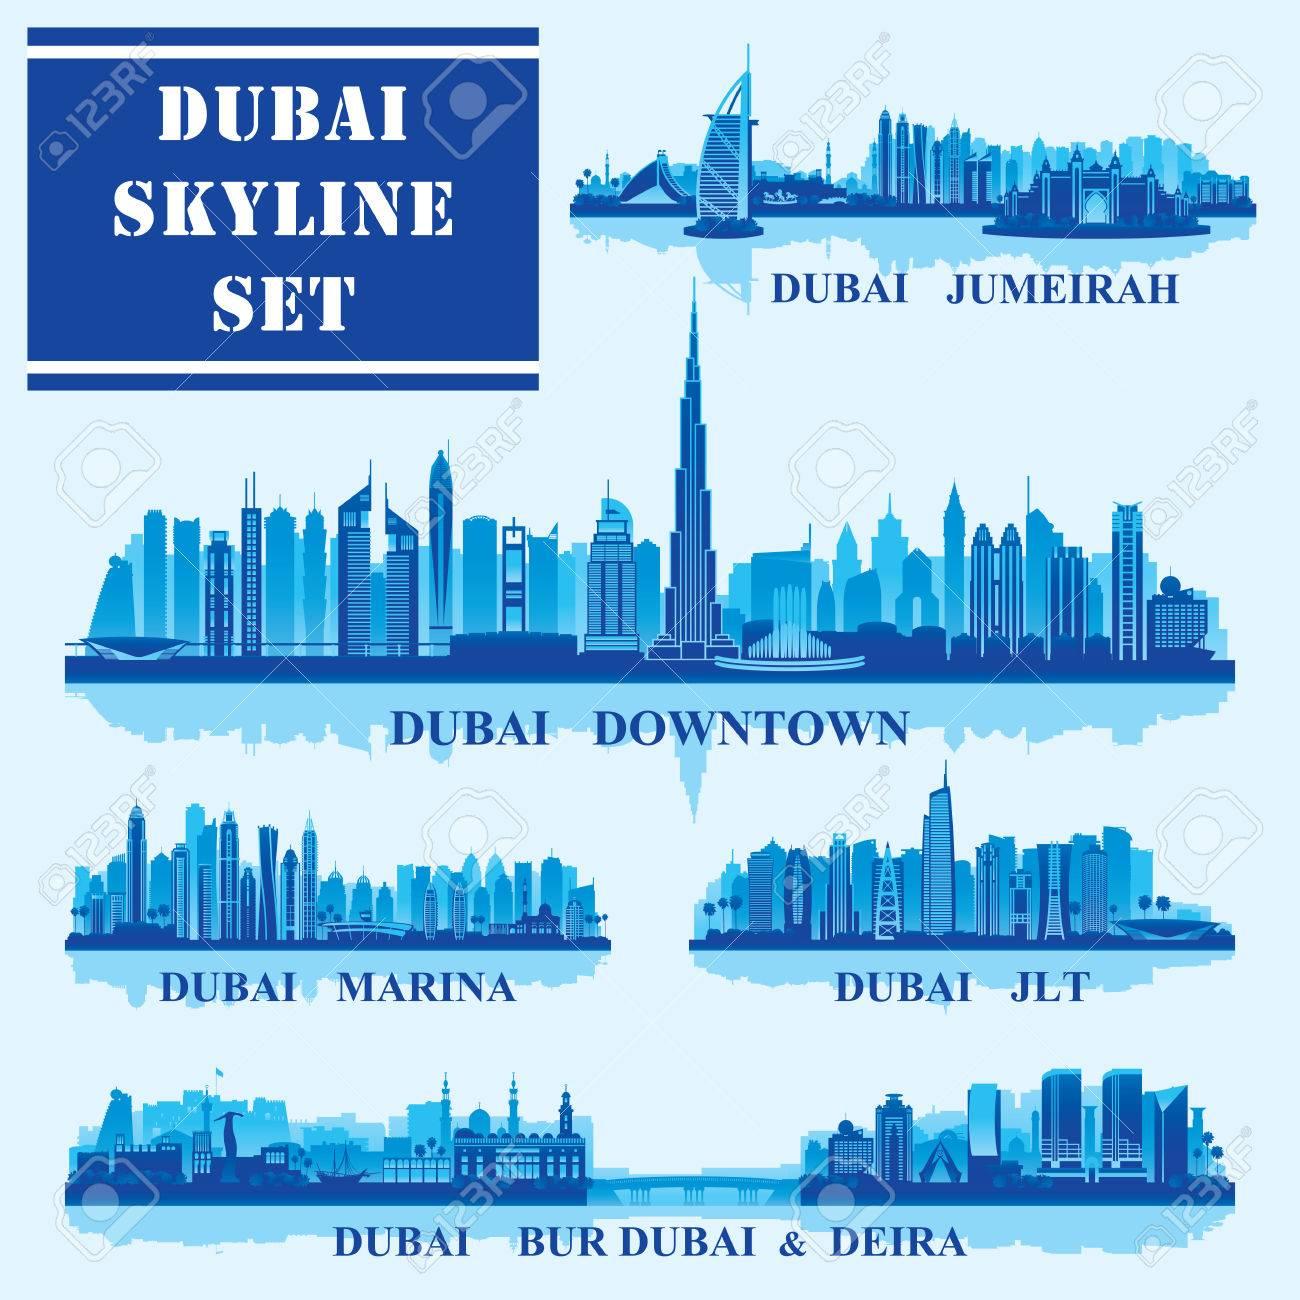 Set of Dubai districts, vector illustration - 55014781